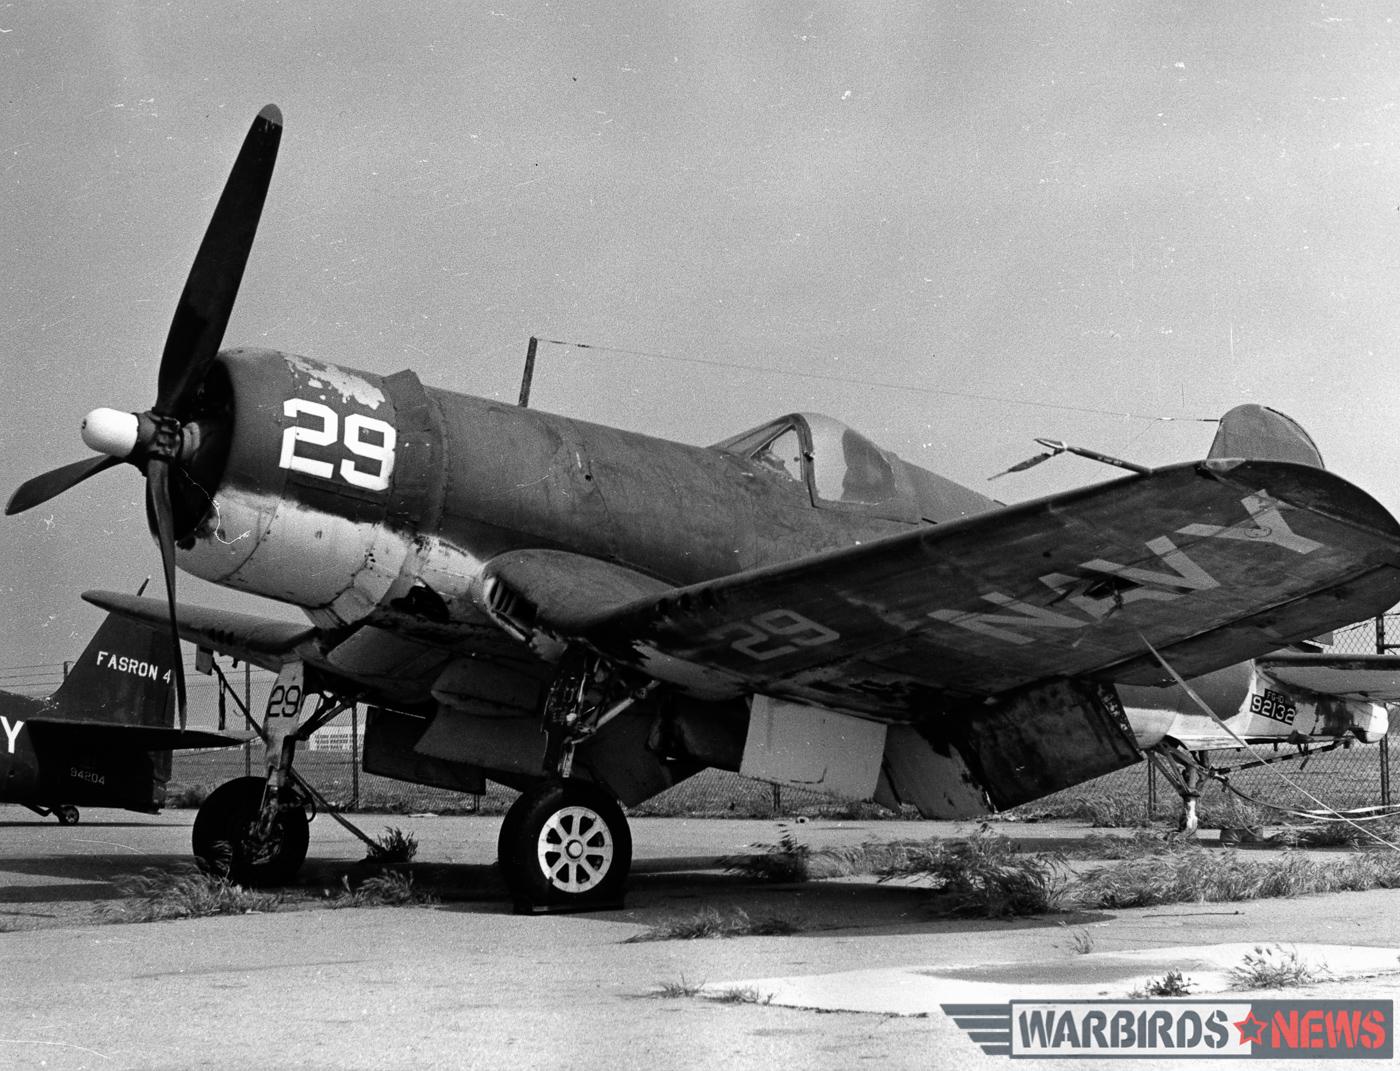 FG-1D 92132 at The Air Museum, Ontario, CA circa-1962. (Jim Sullivan Collection)